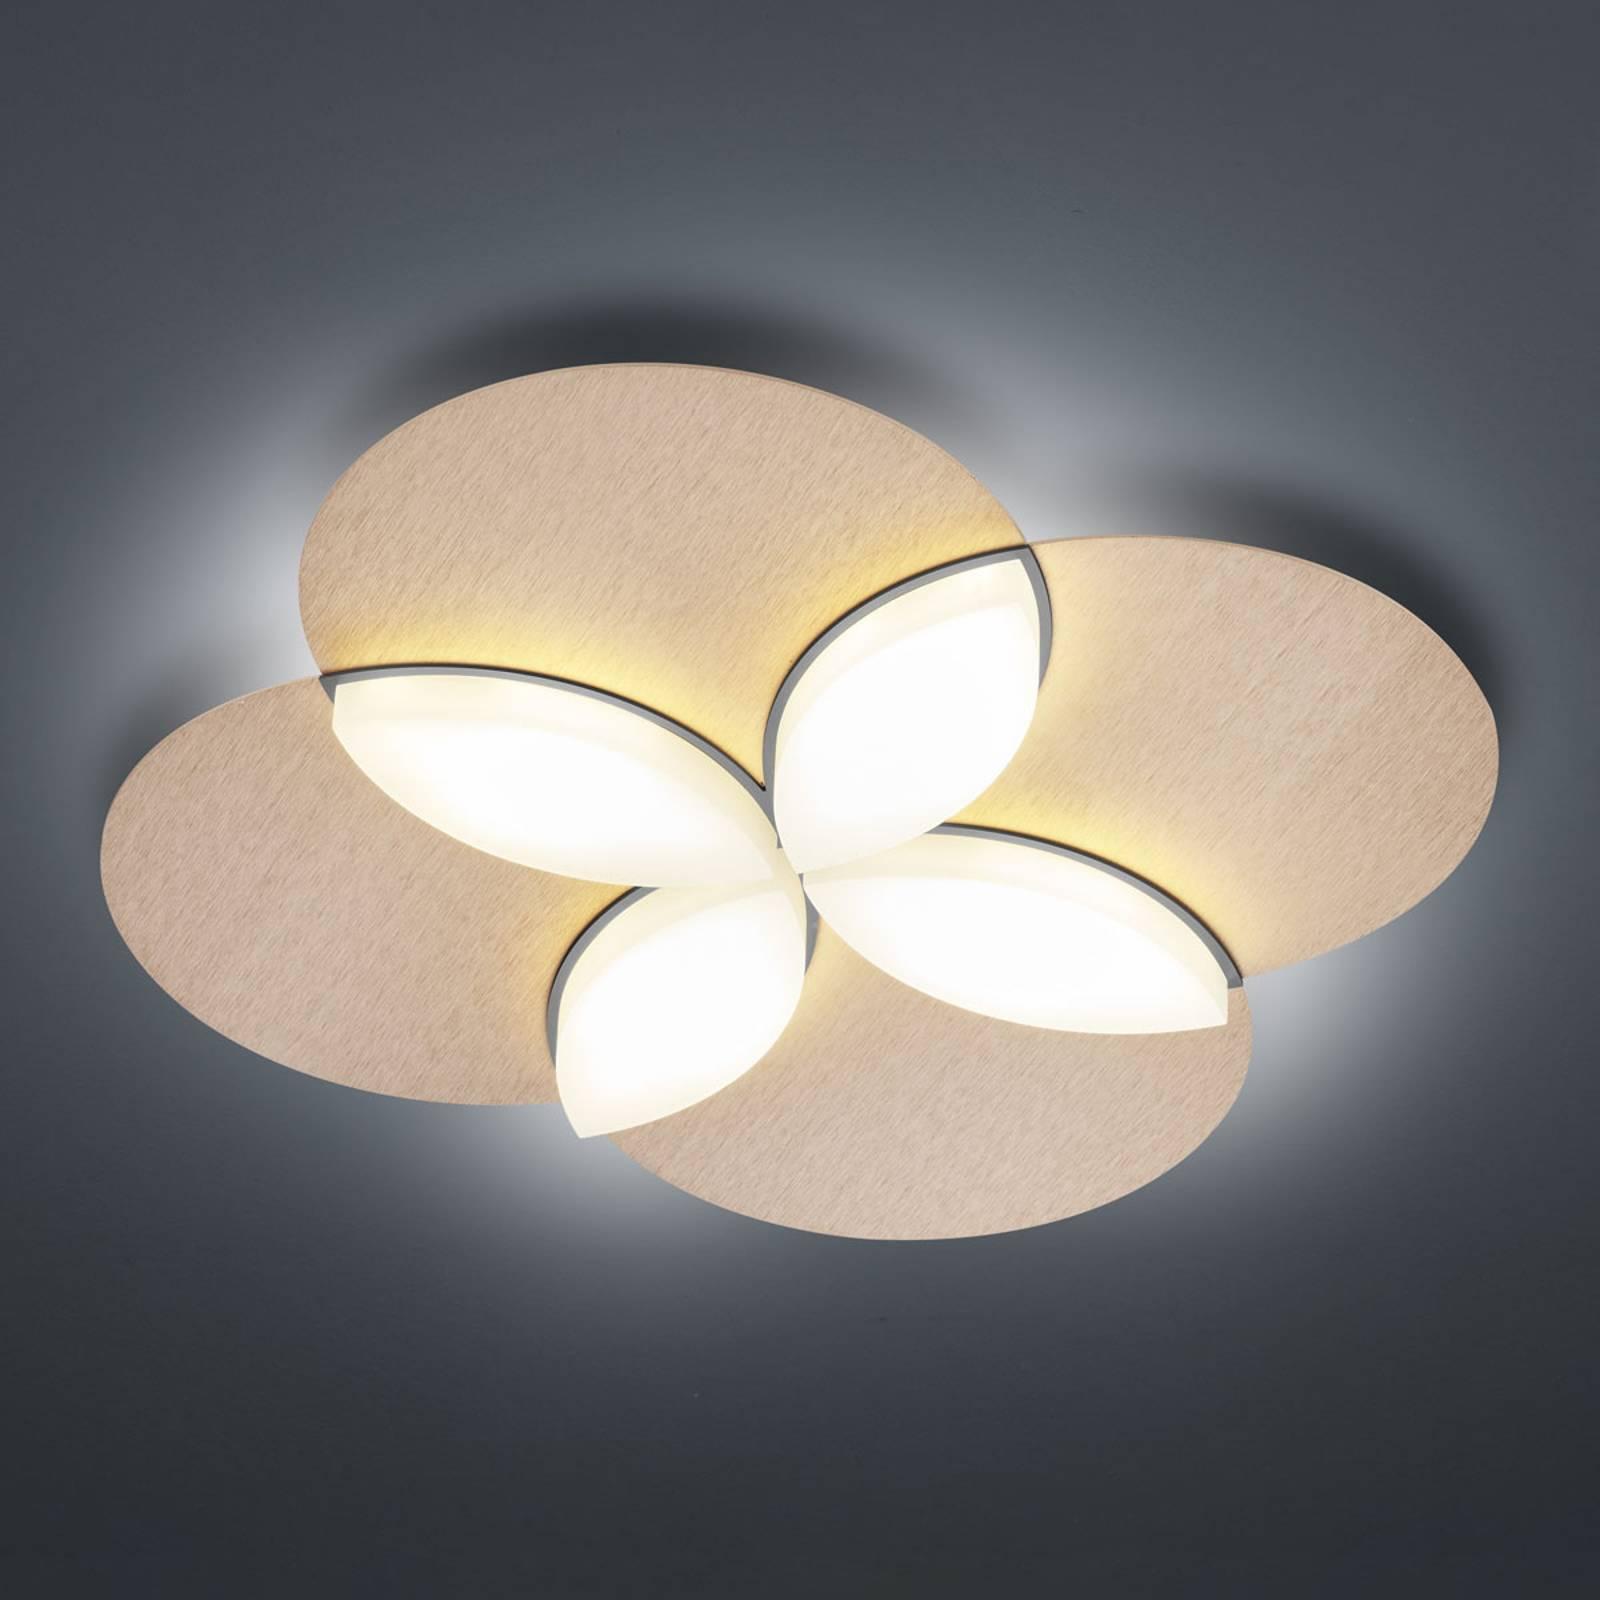 BANKAMP Spring -LED-kattovalaisin, ruusukulta